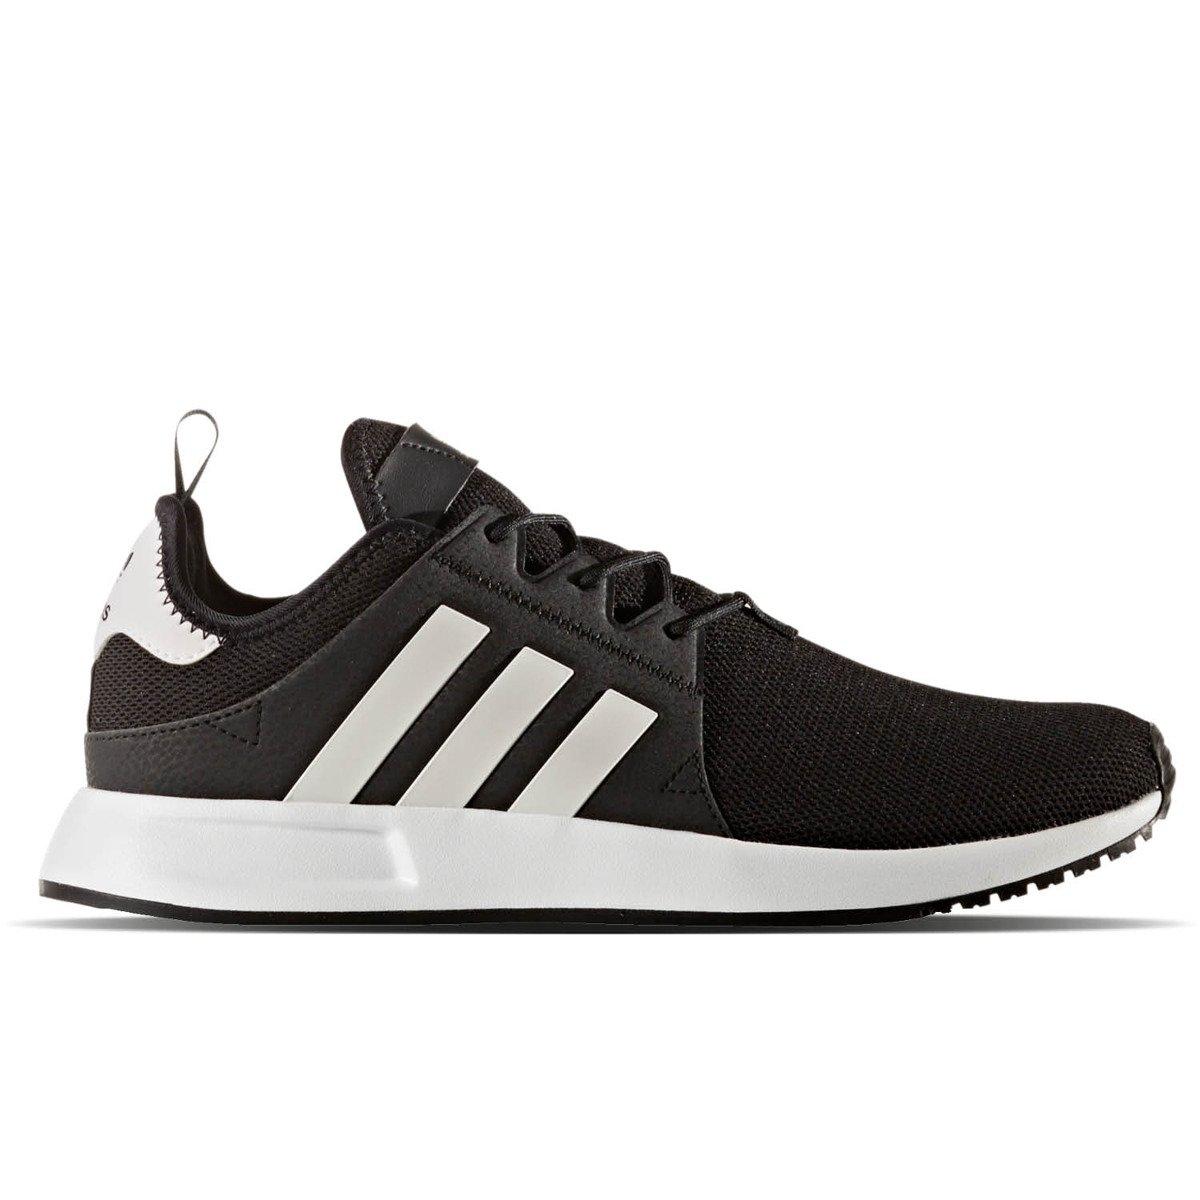 Adidas Originals X Plr Casual Shoes